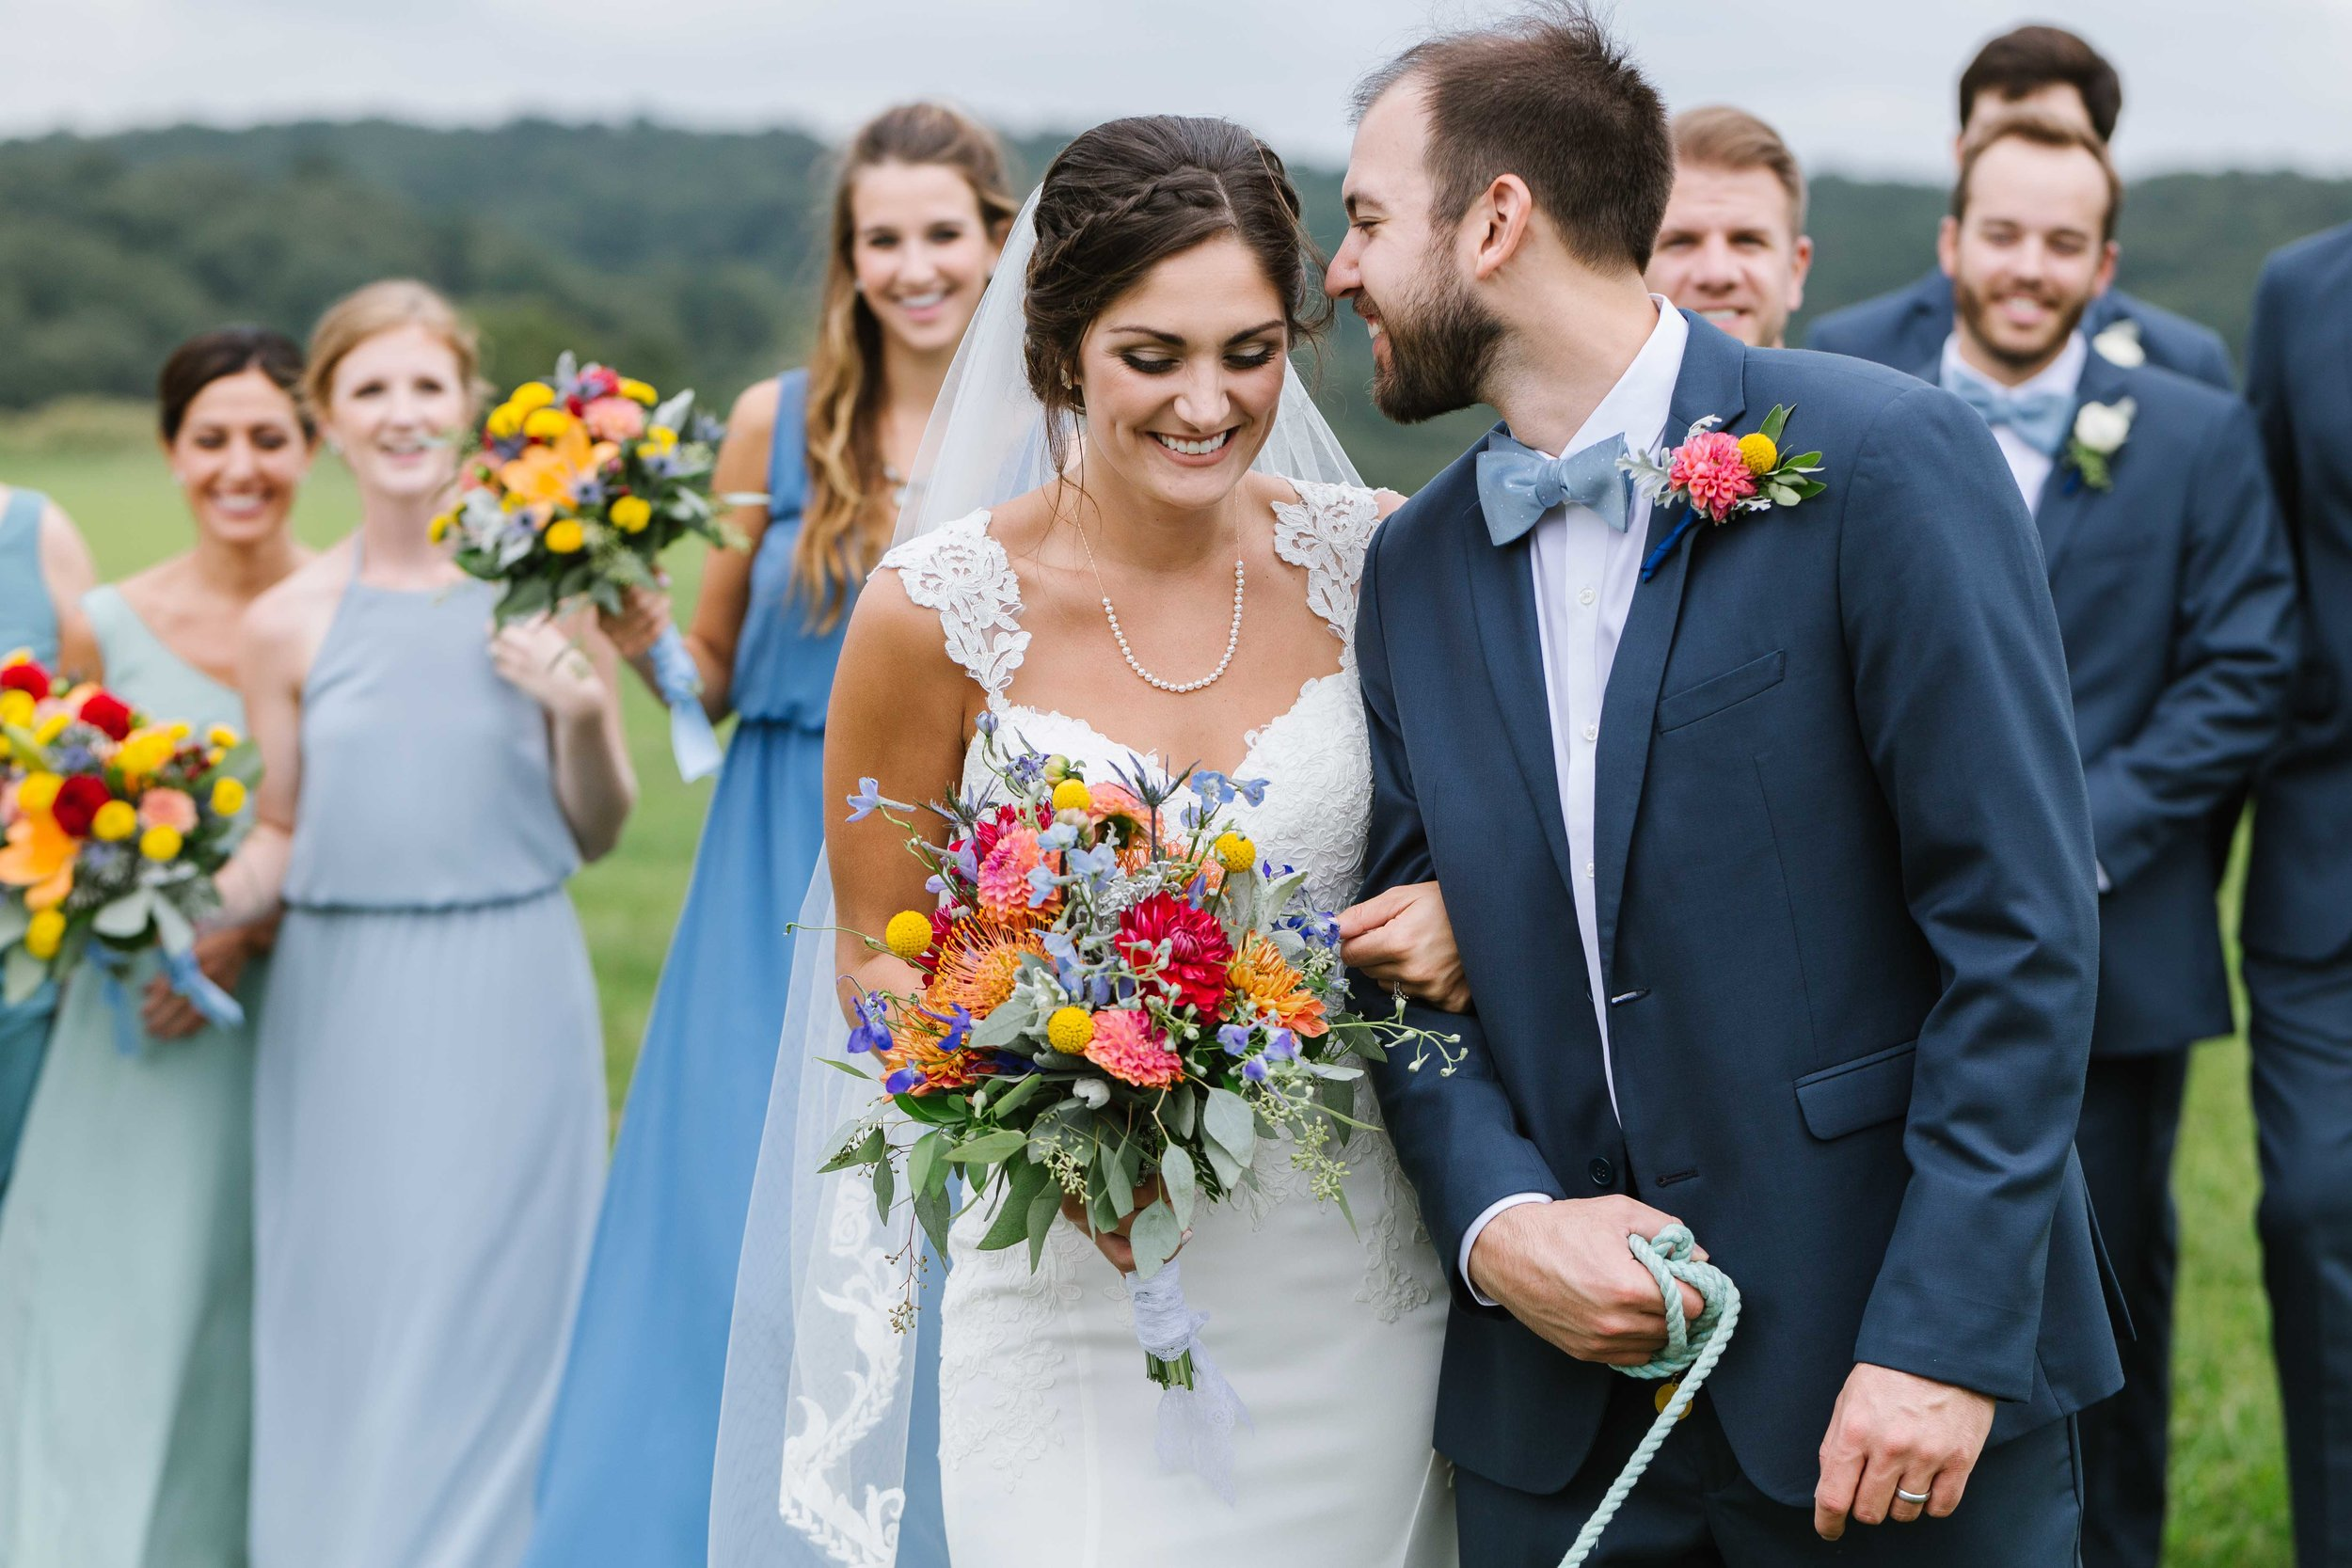 urban-row-photo-wyndridge-farm-wedding-15.jpg